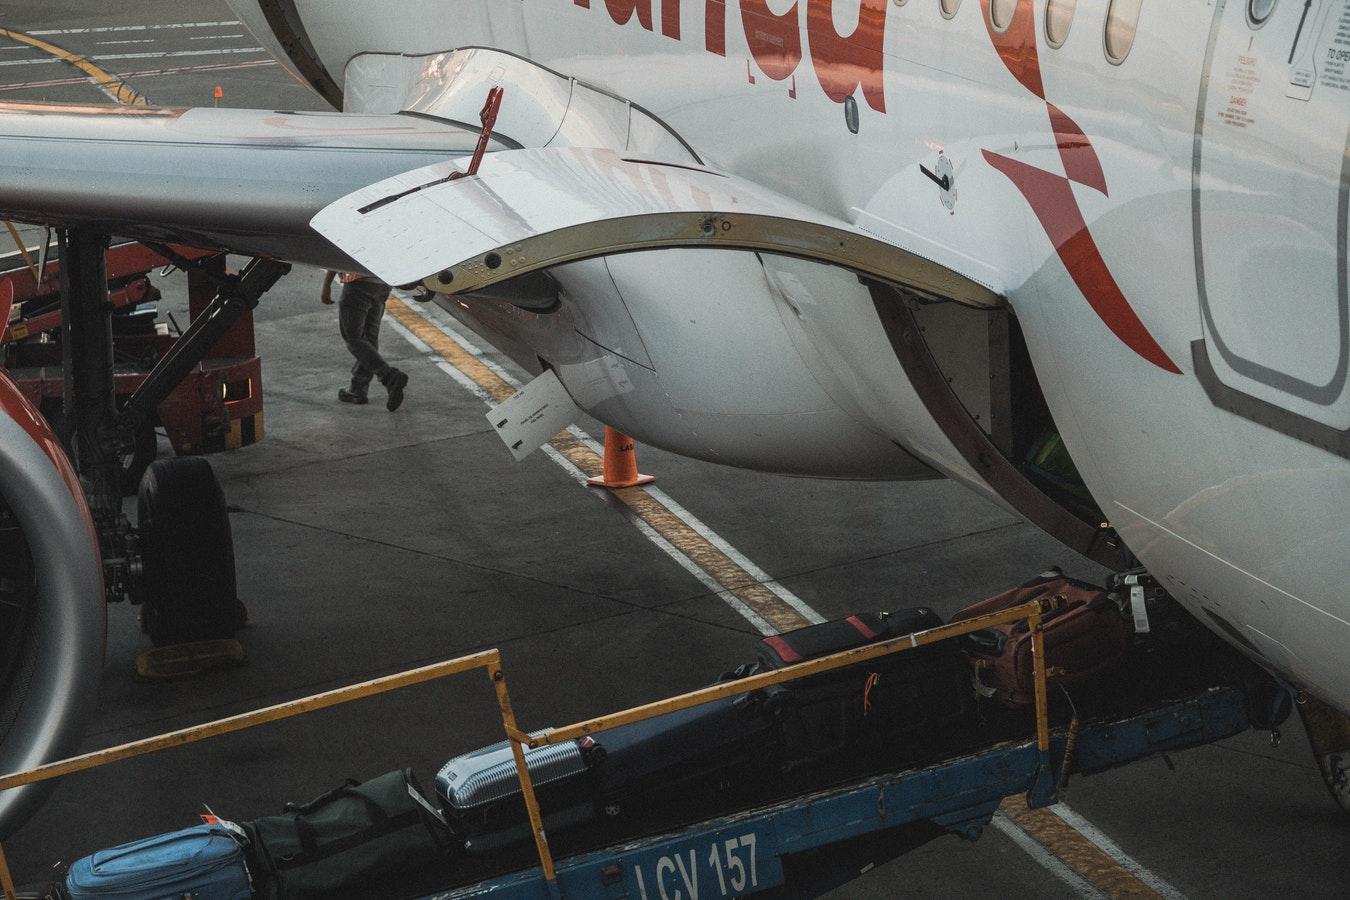 Airplane luggage storage